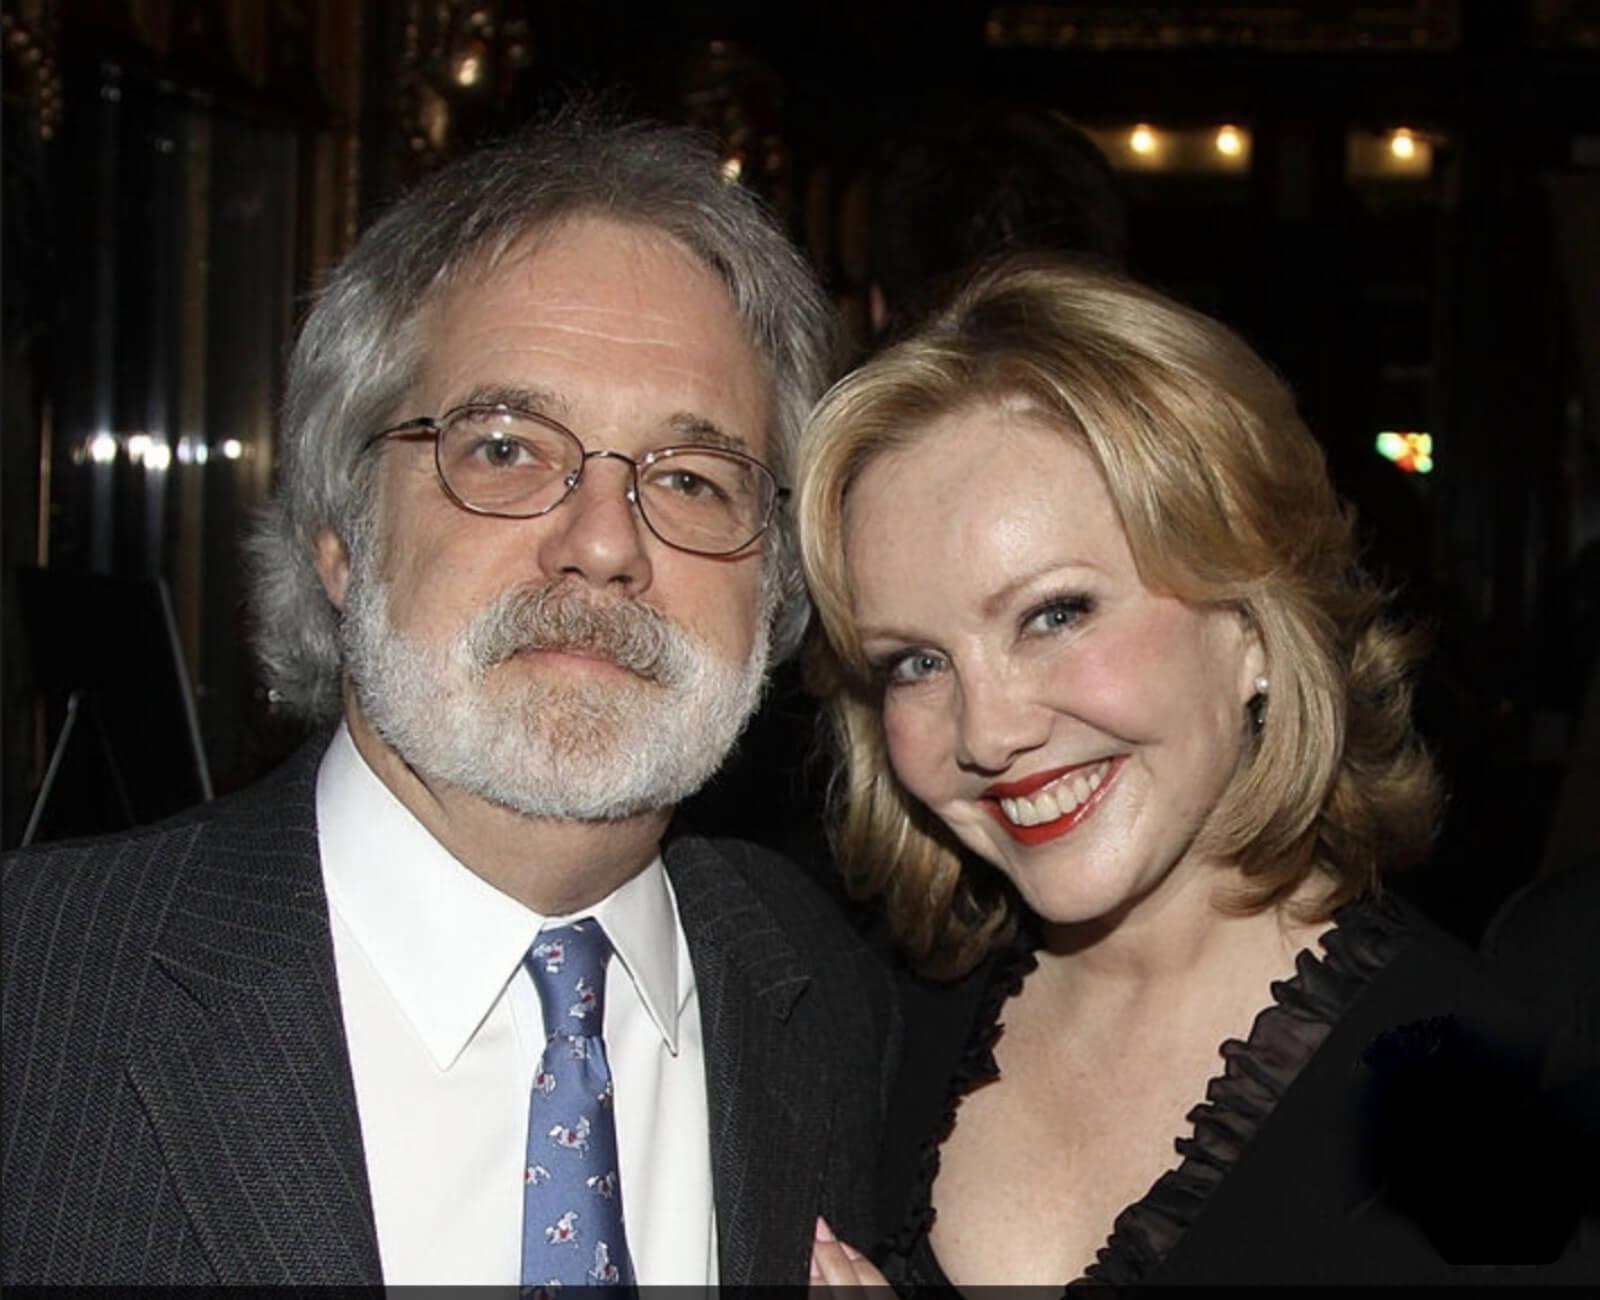 Susan Stroman with her award-winning collaborator, John Weidman. Both in elegant attire.